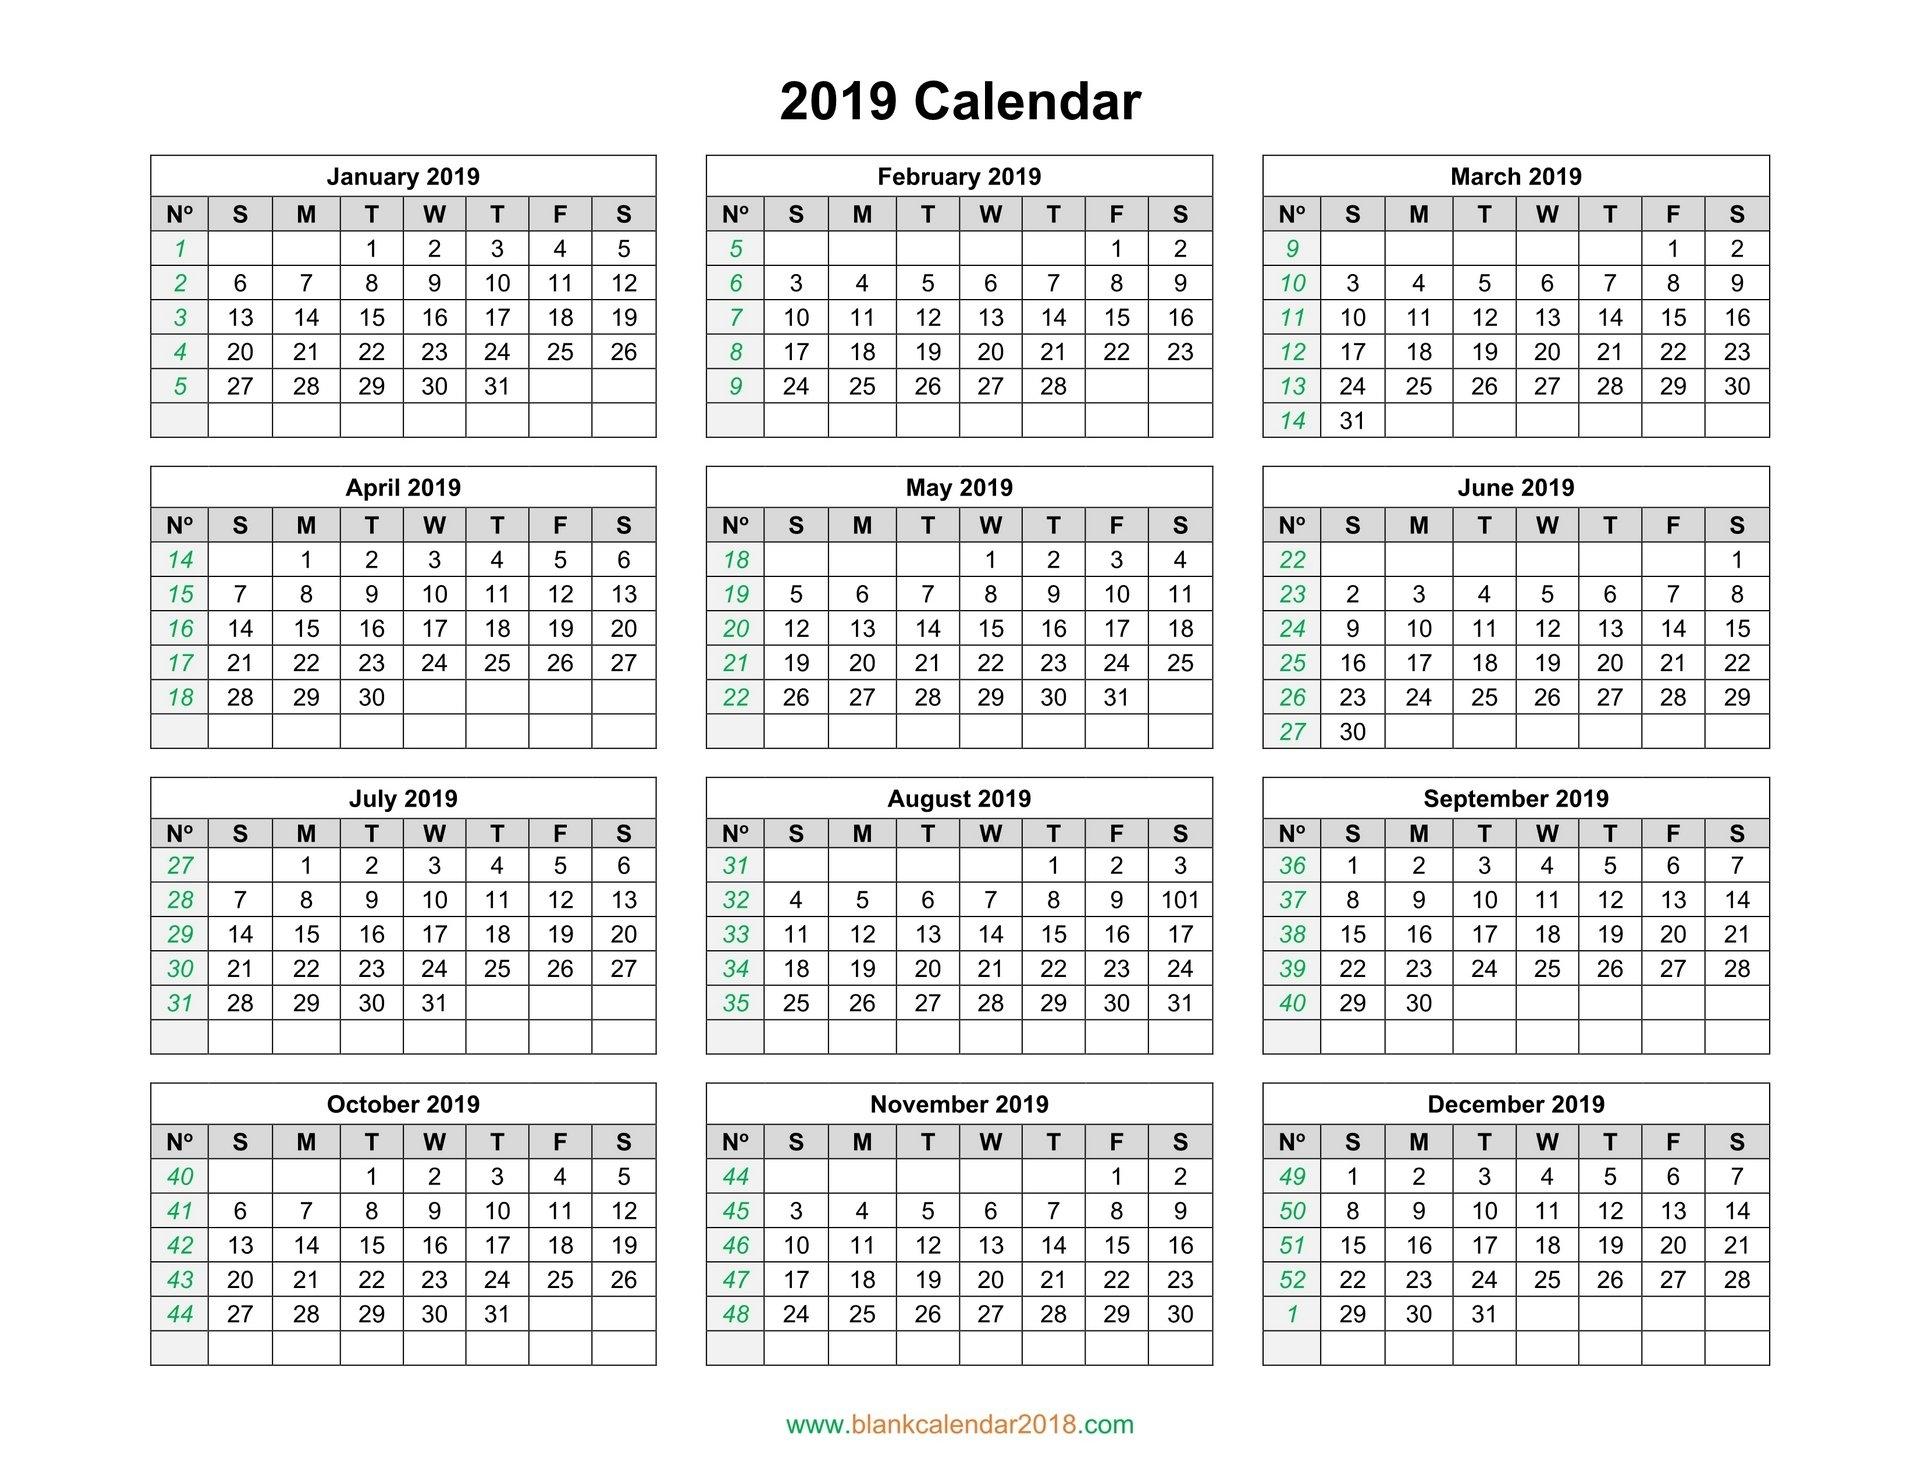 Blank Calendar 2019 E Calendar 2019 Download